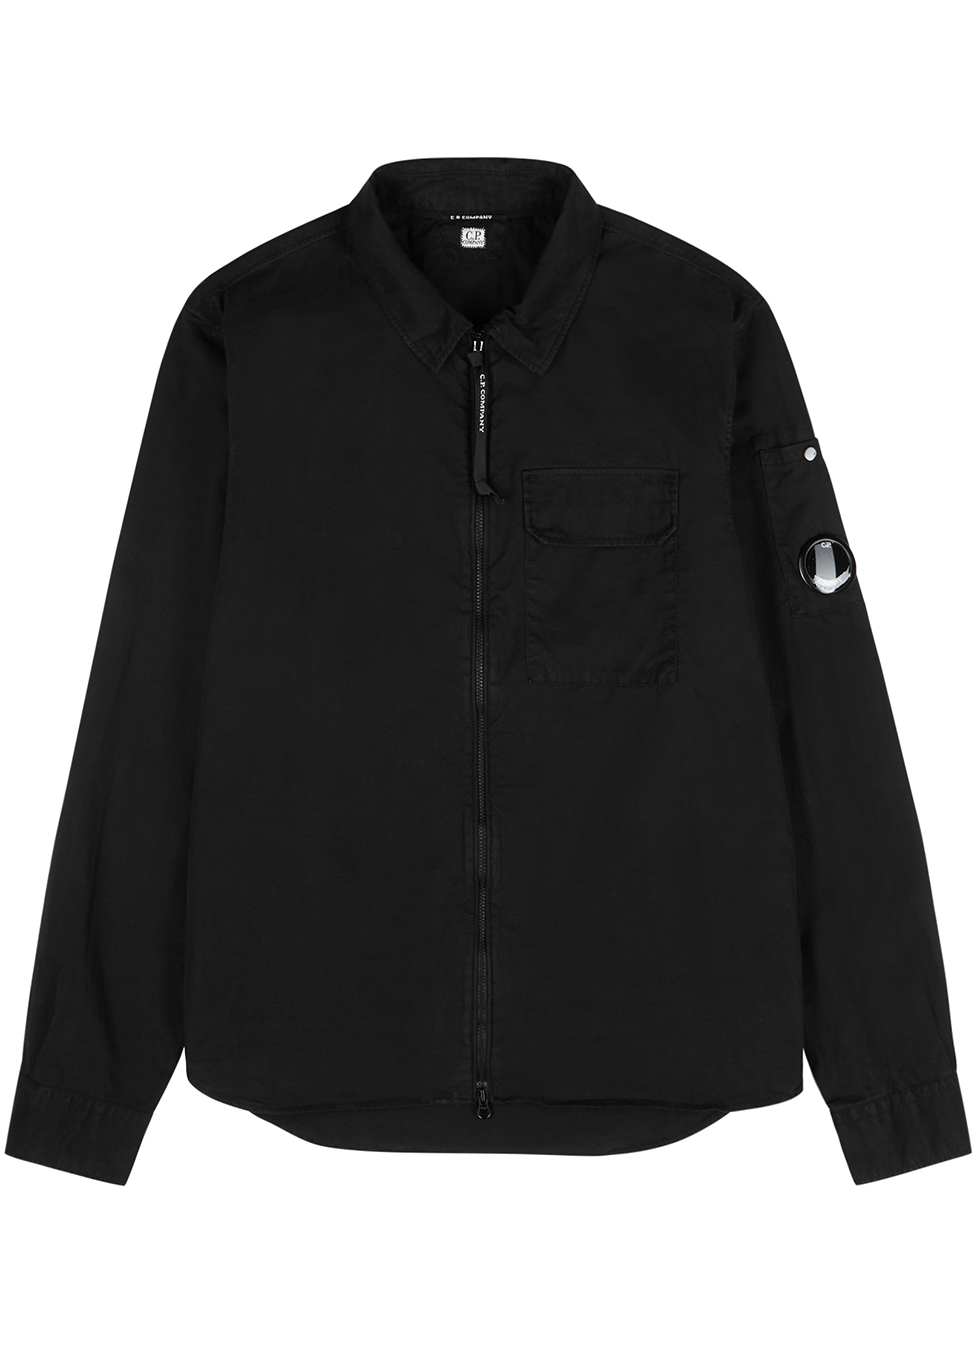 Black cotton overshirt